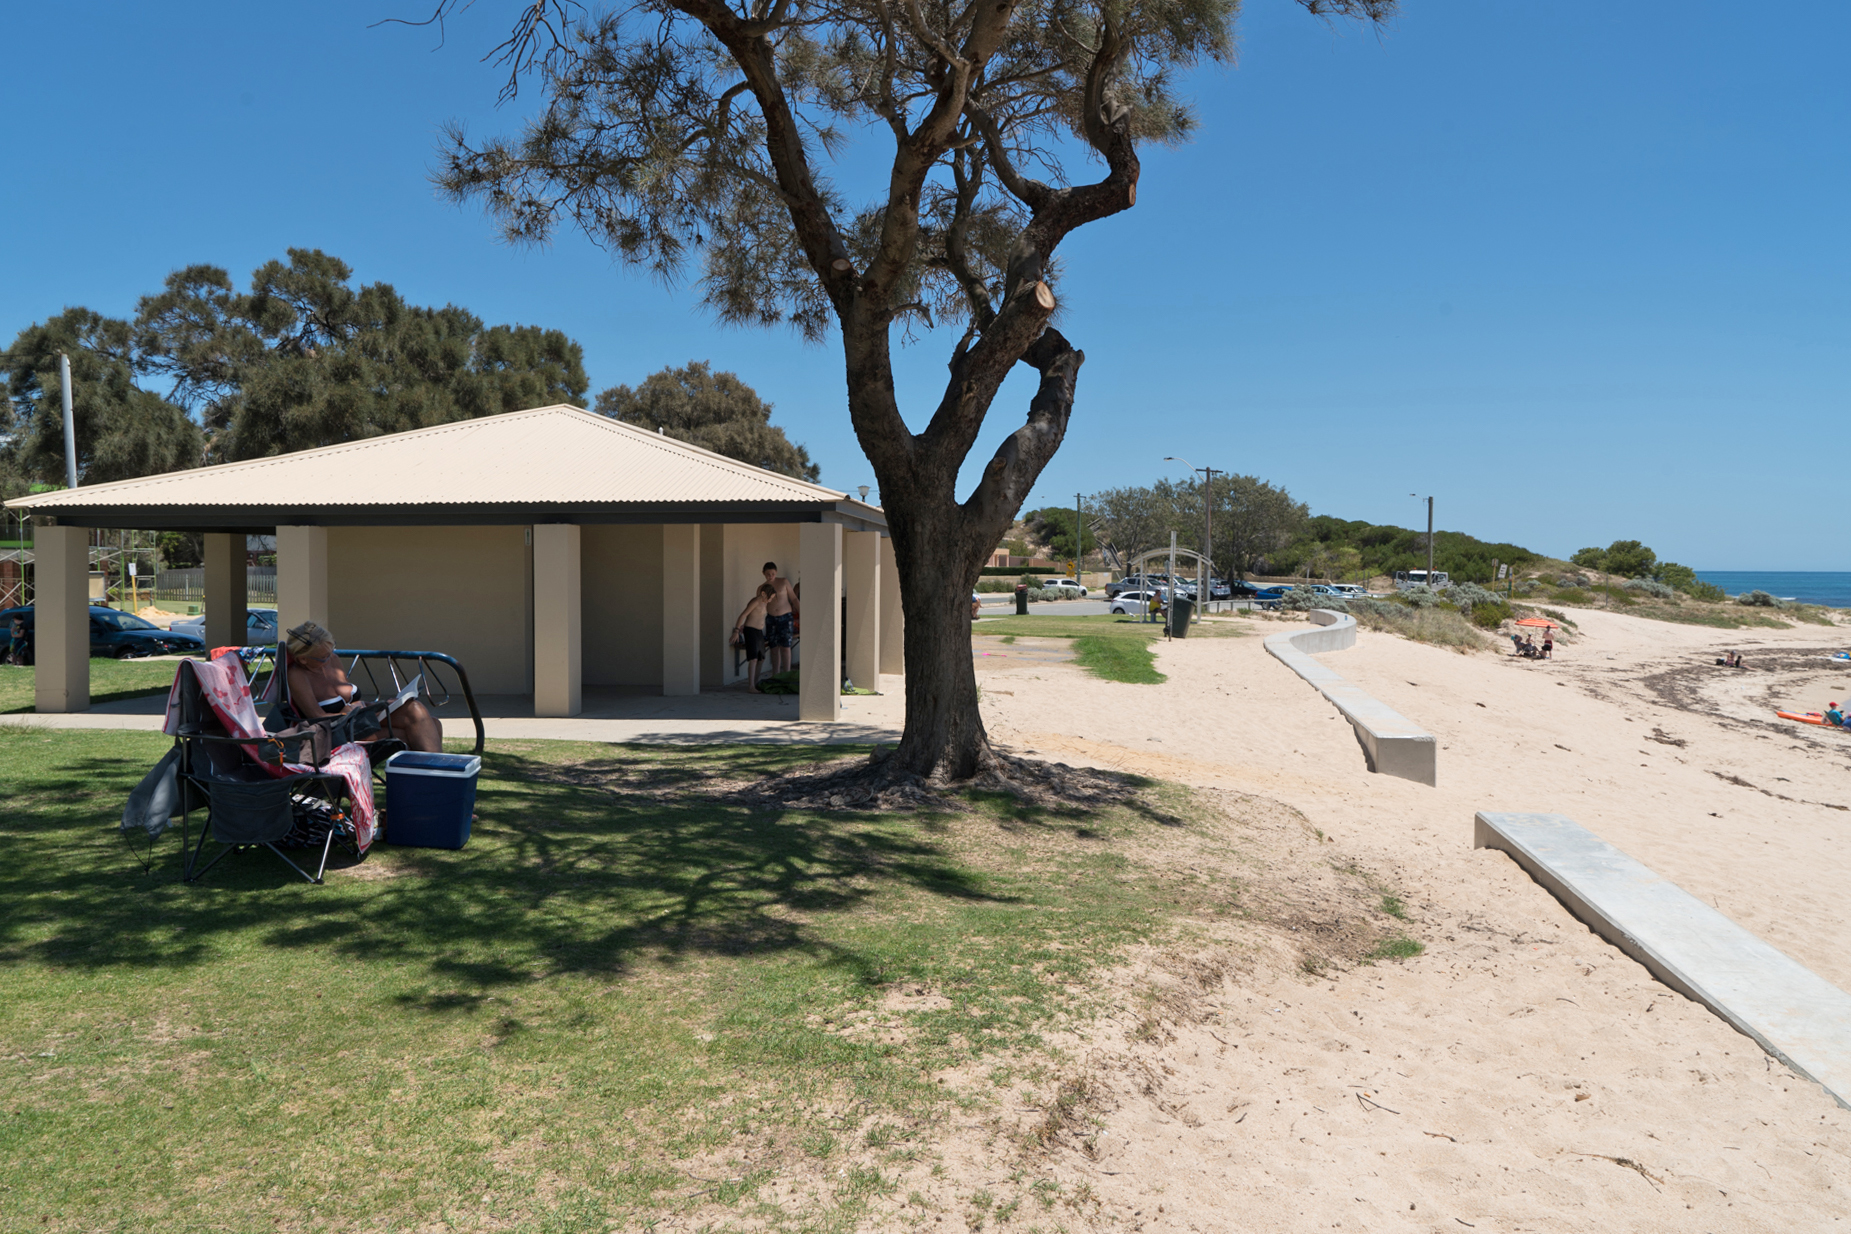 Plate 11: Falcon Bay Beach – the turn around point